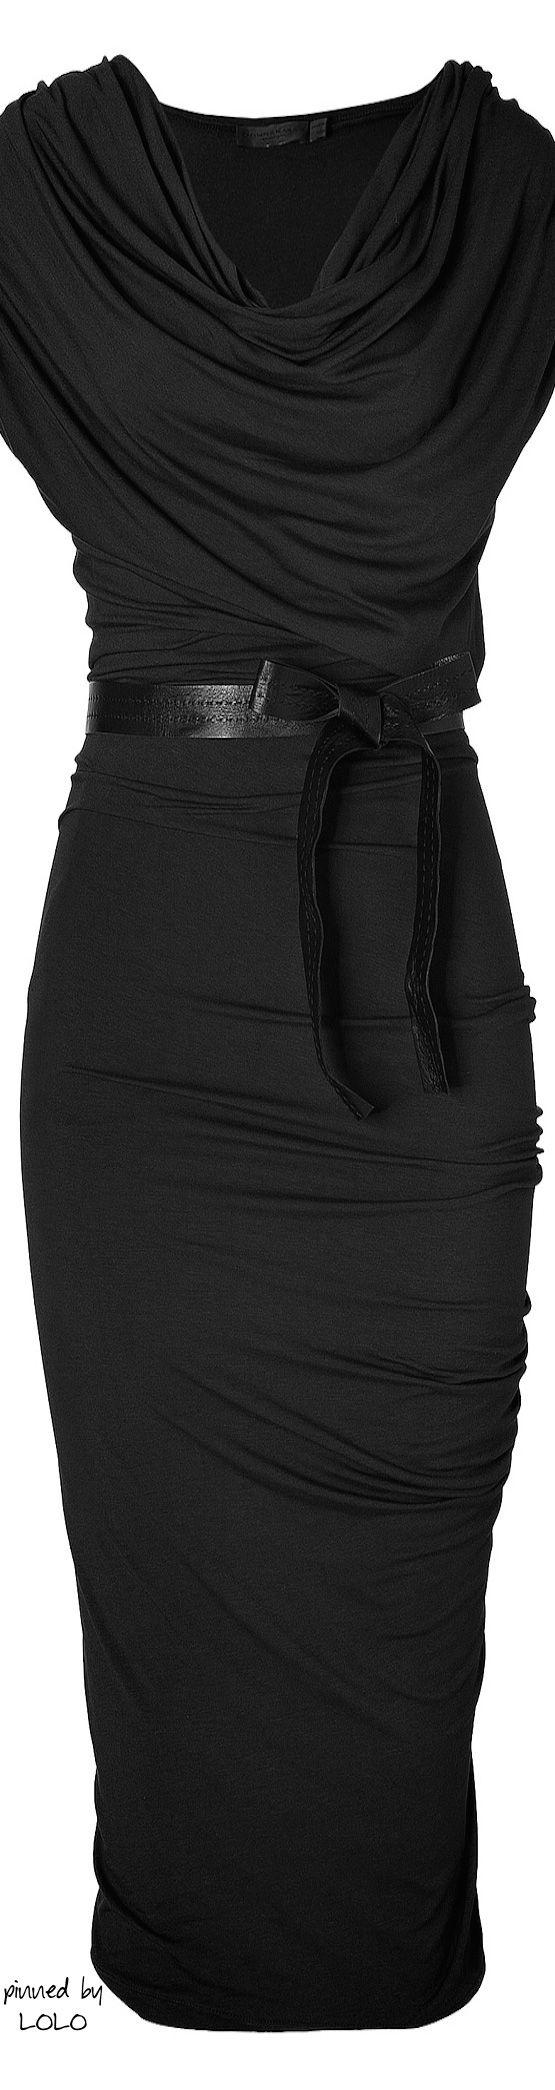 Donna Karan New York Black Draped Jersey Dress